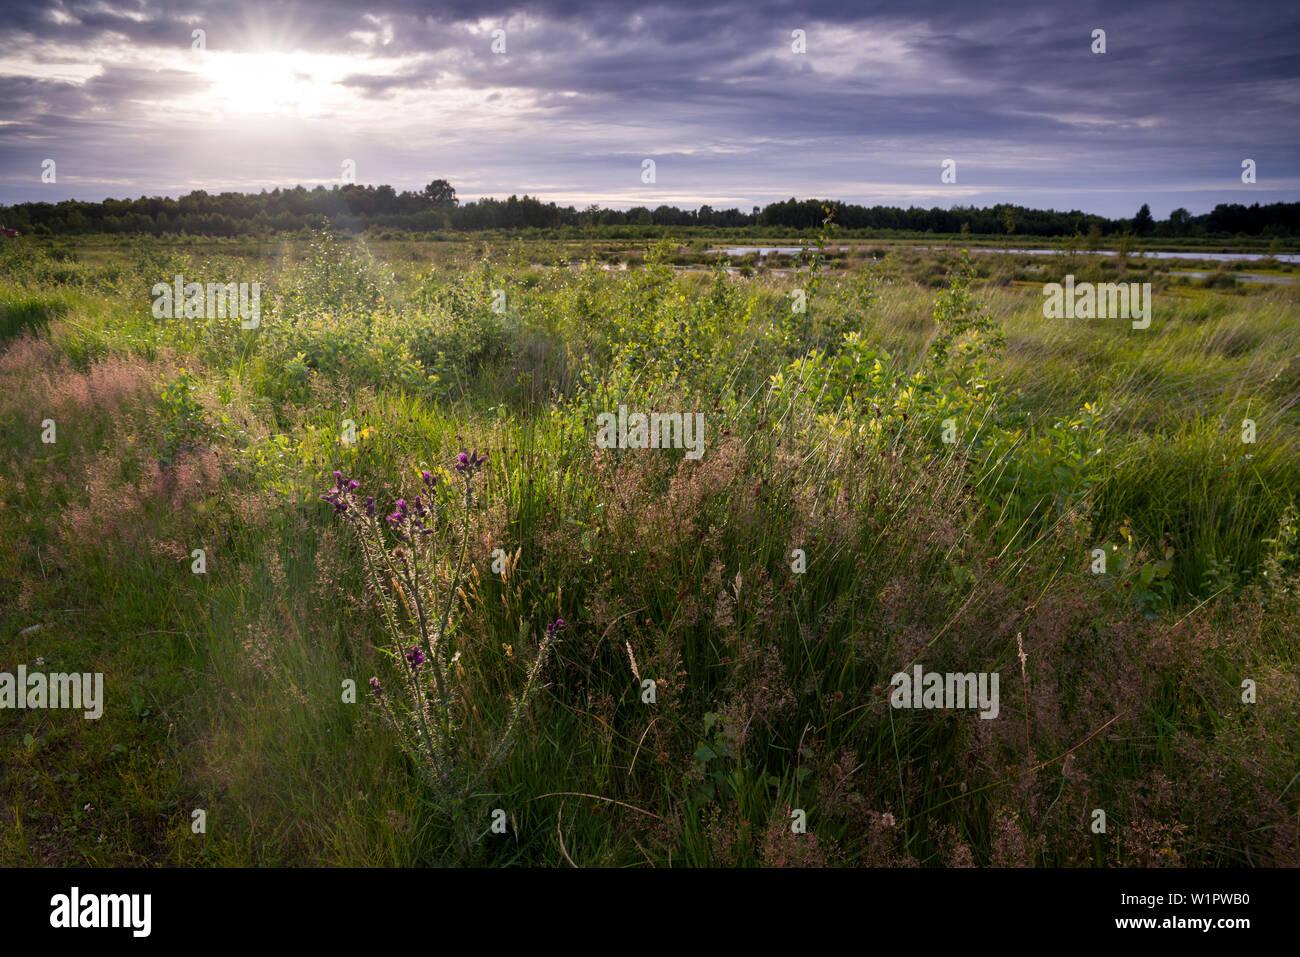 Goldenstedter Moor in the evening light, Goldenstedt, Vechta, Wildeshauser Geest, Lower Saxony, Germany Stock Photo